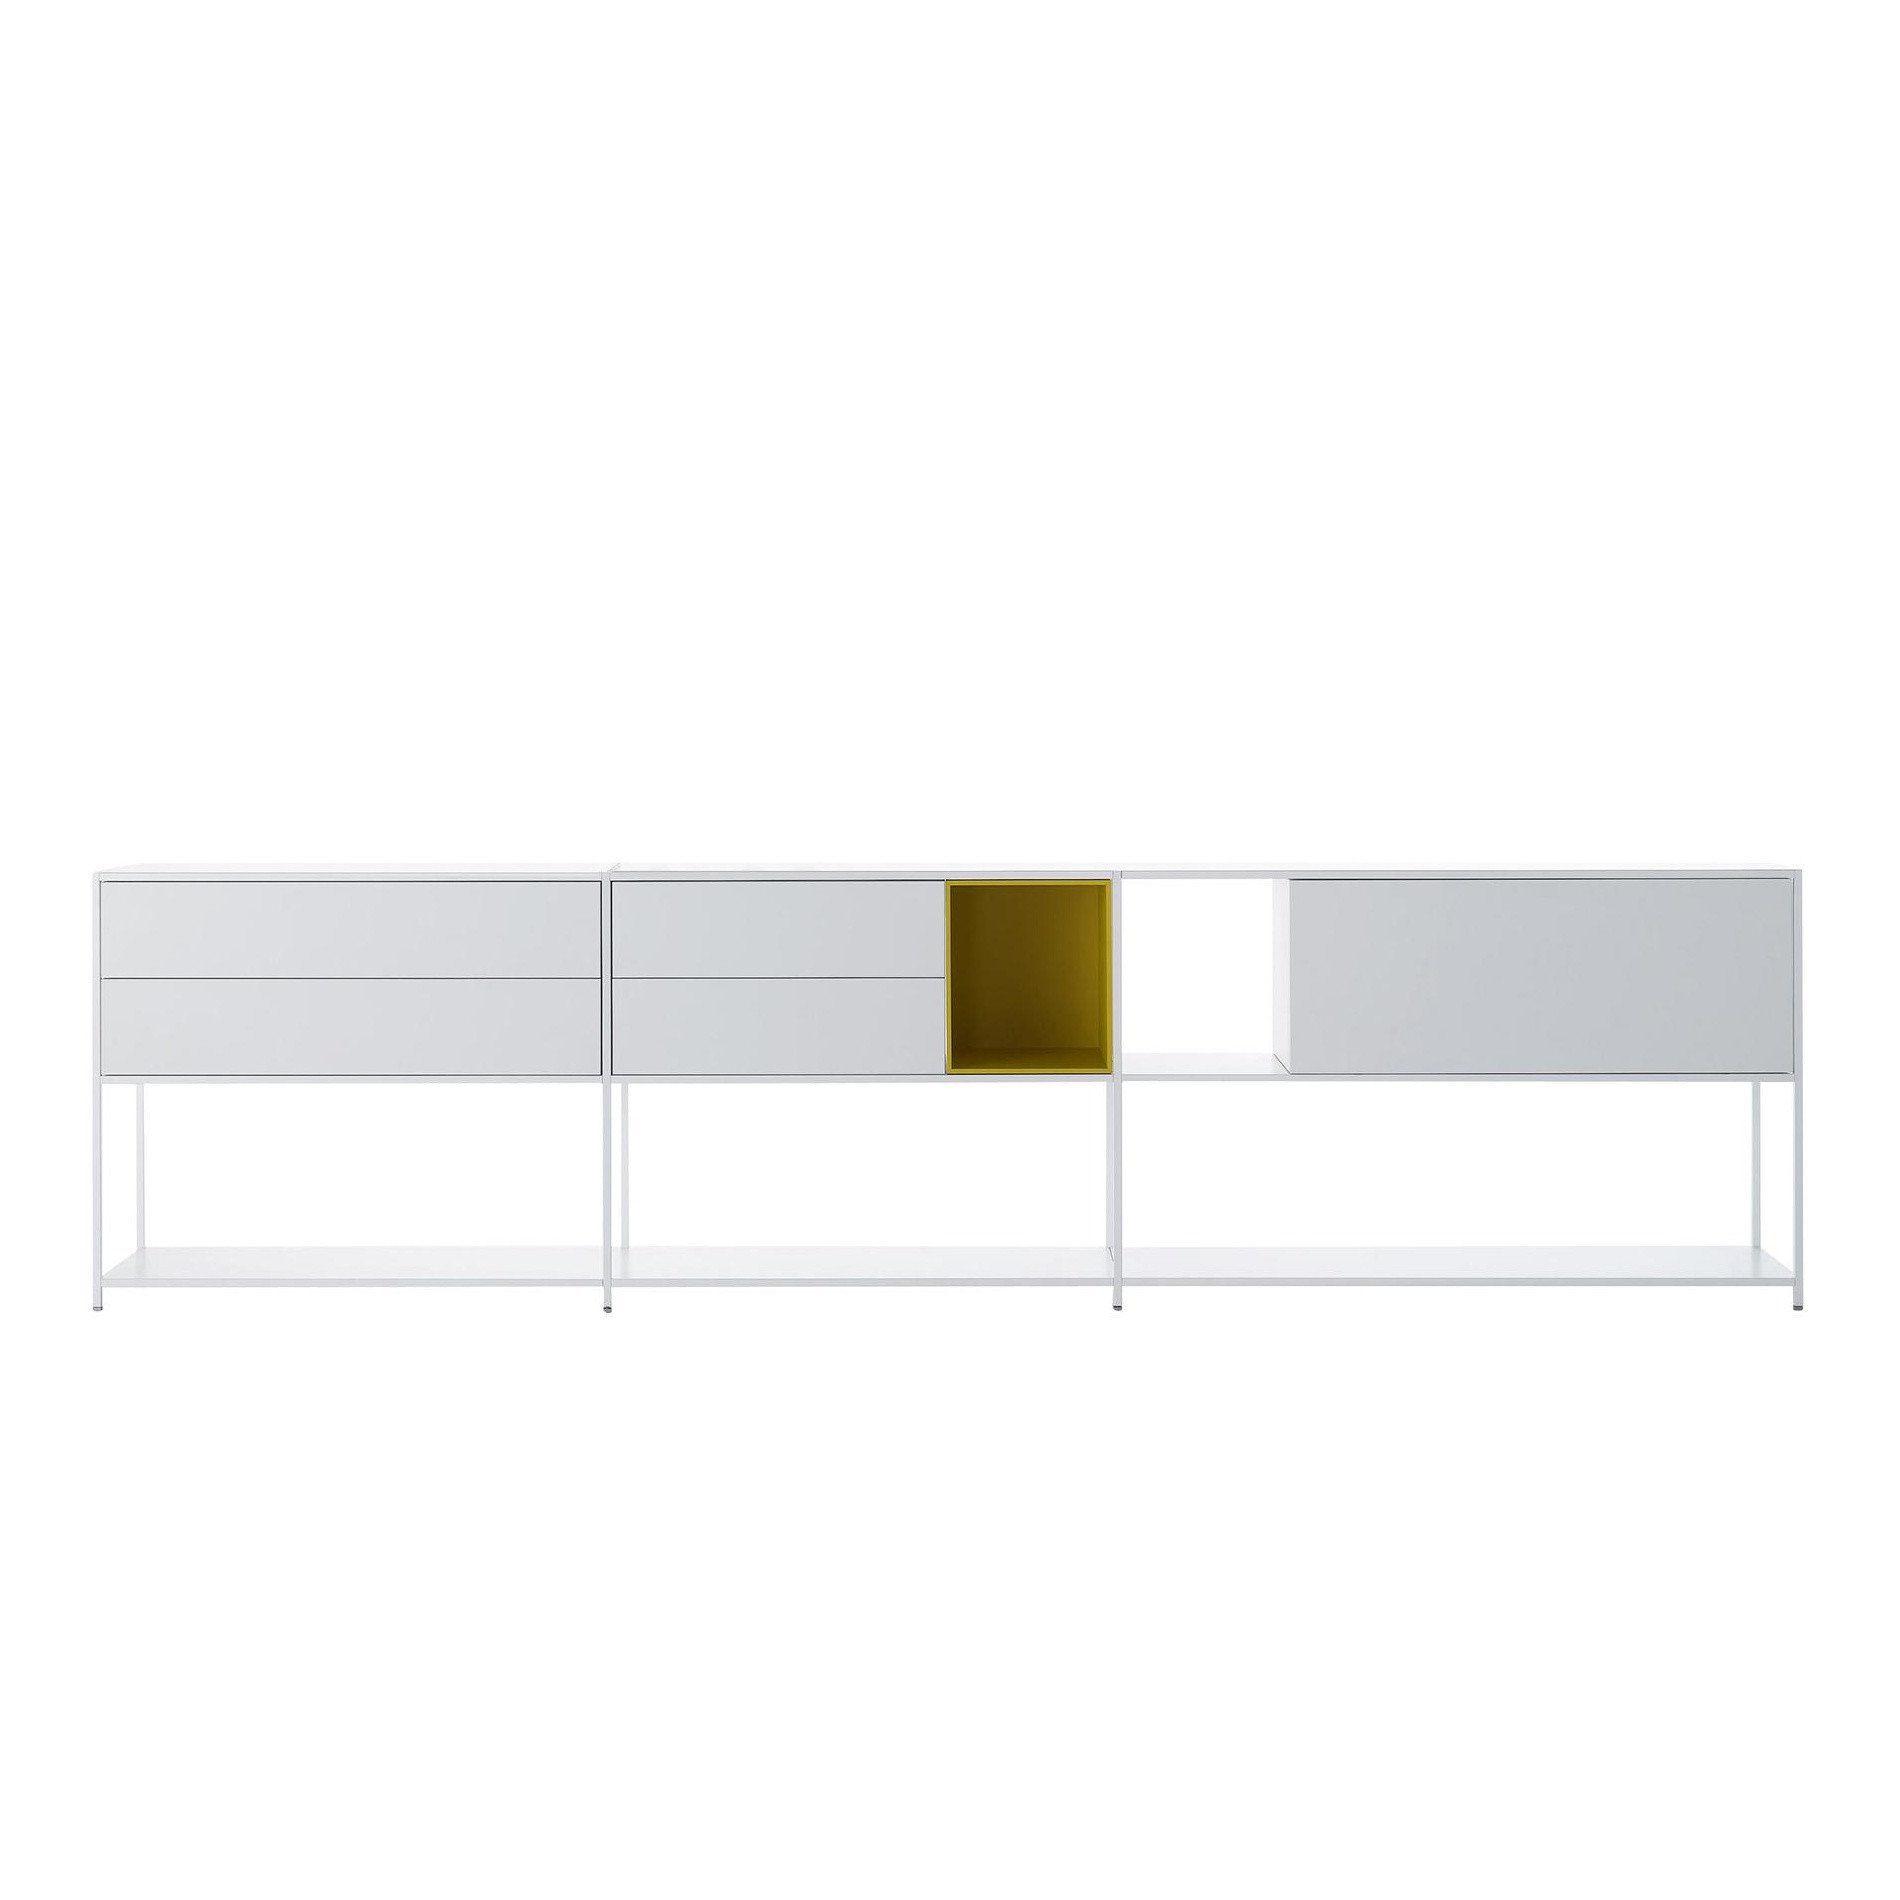 mdf italia minima 3 0 sideboard 306x33x79cm ambientedirect. Black Bedroom Furniture Sets. Home Design Ideas